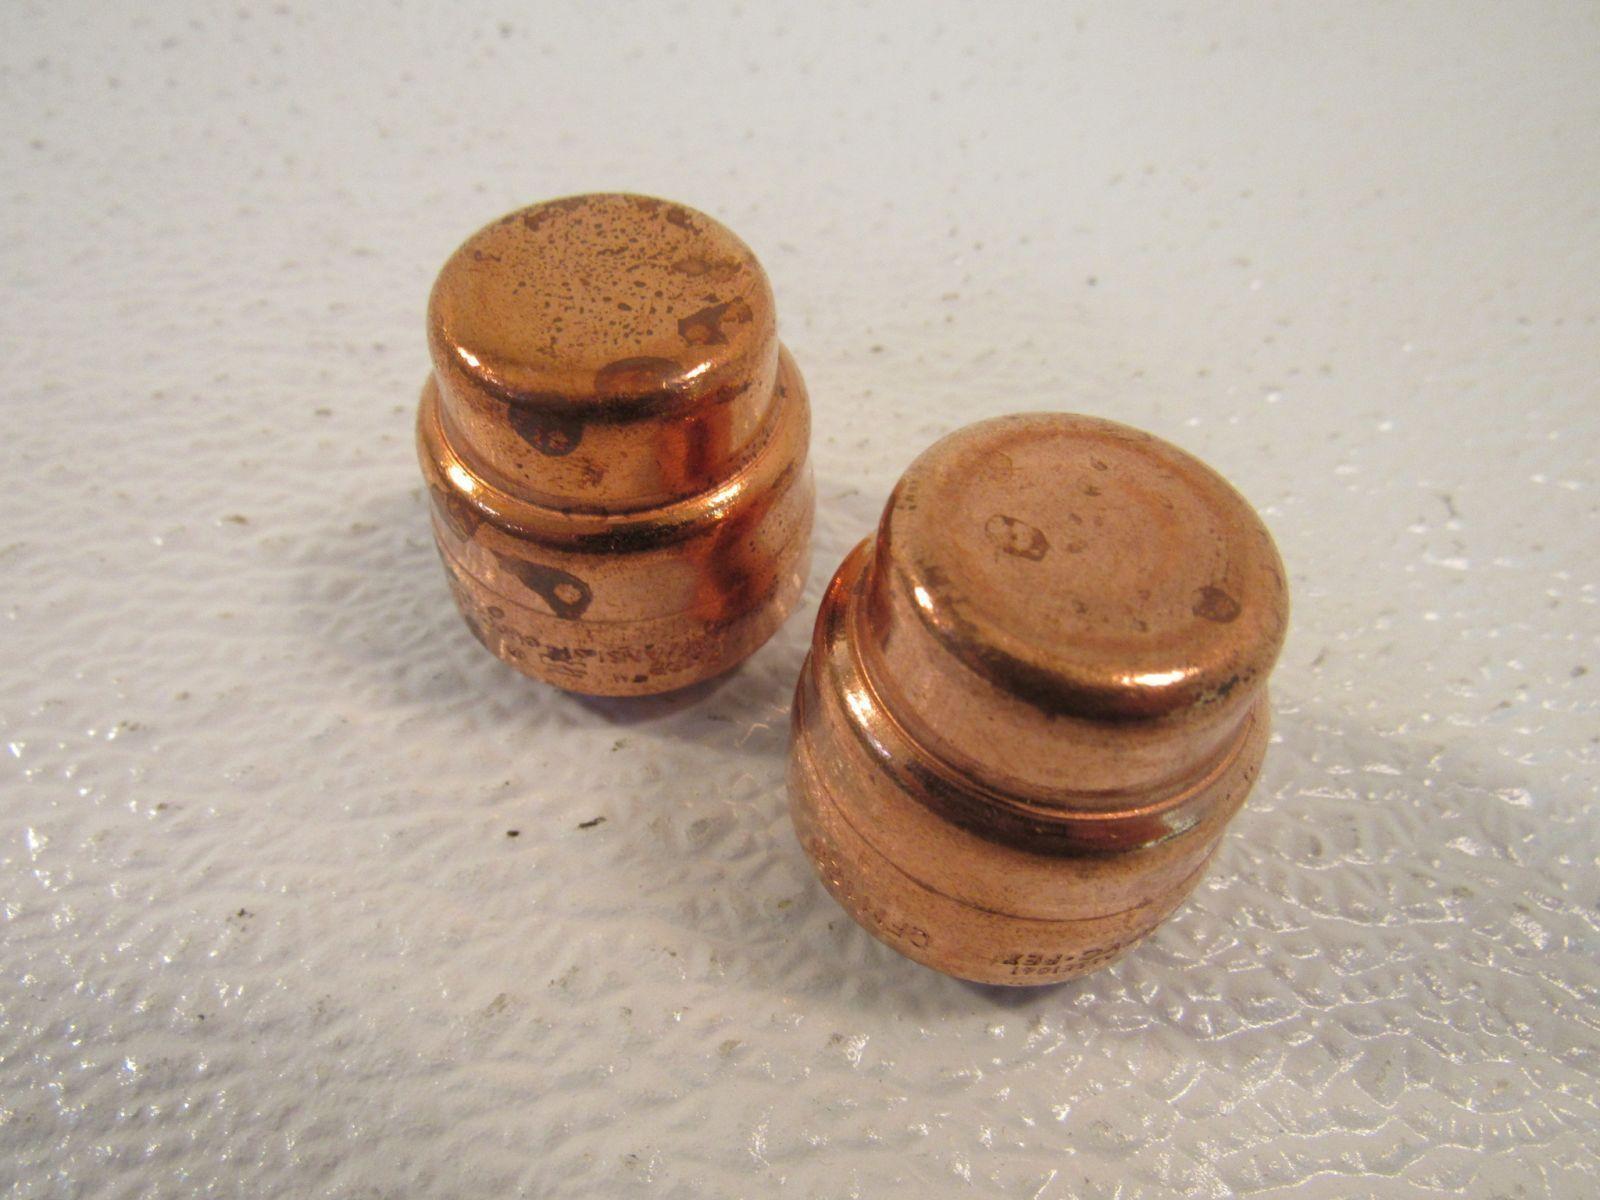 Standard 3/4in SharkBite End Cap Lot of 2 OFH104 Copper